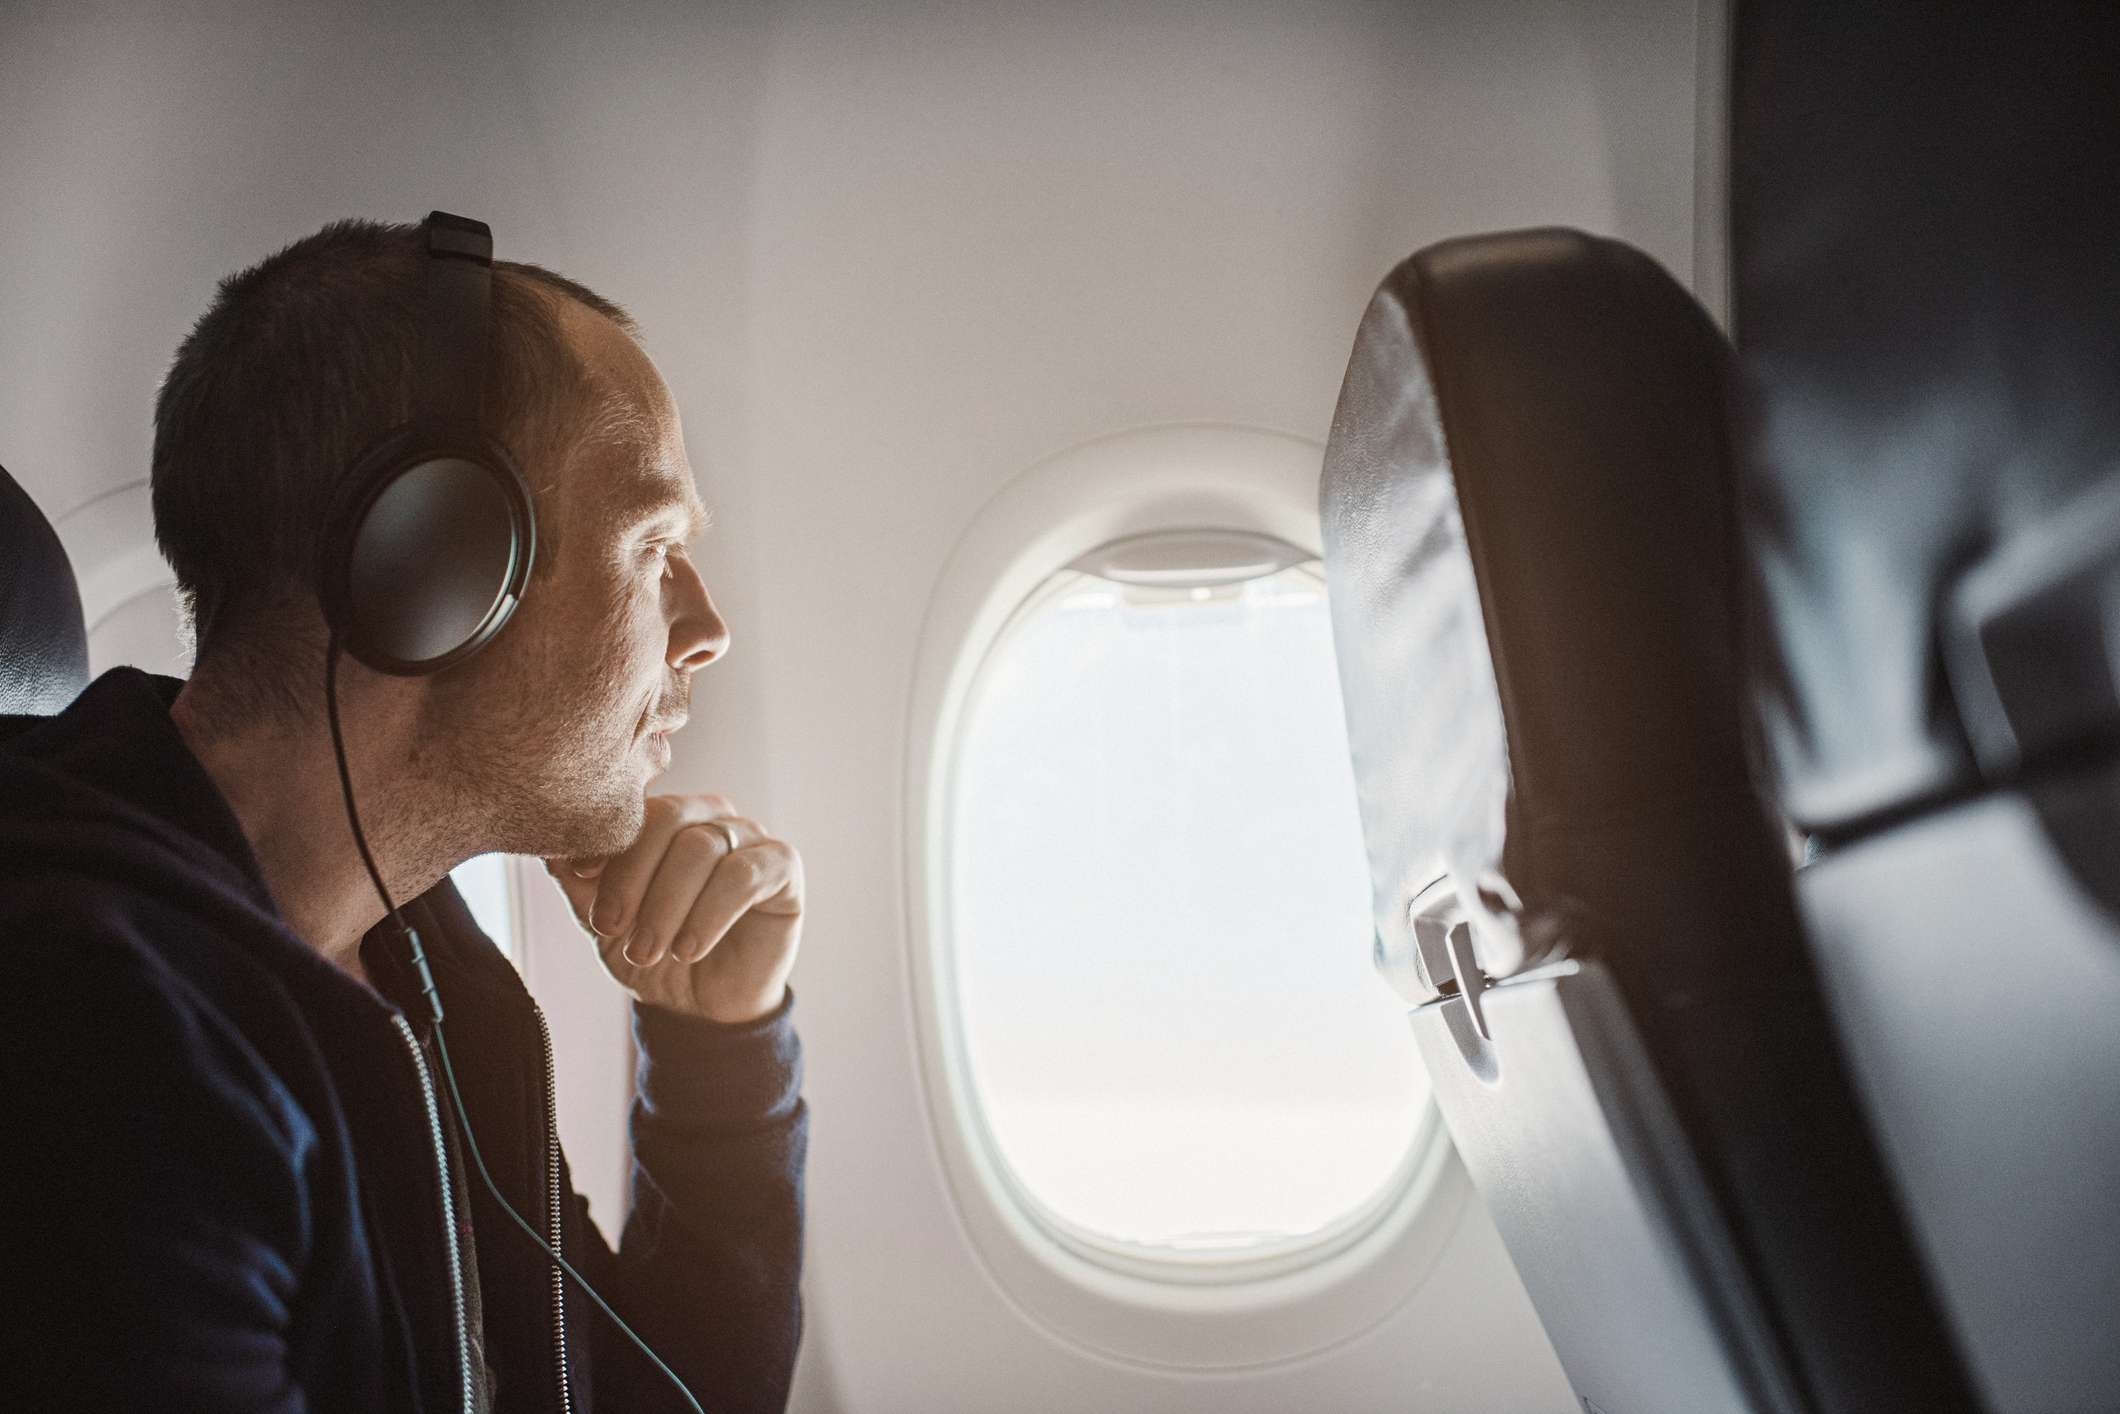 Man on plane wearing headphones